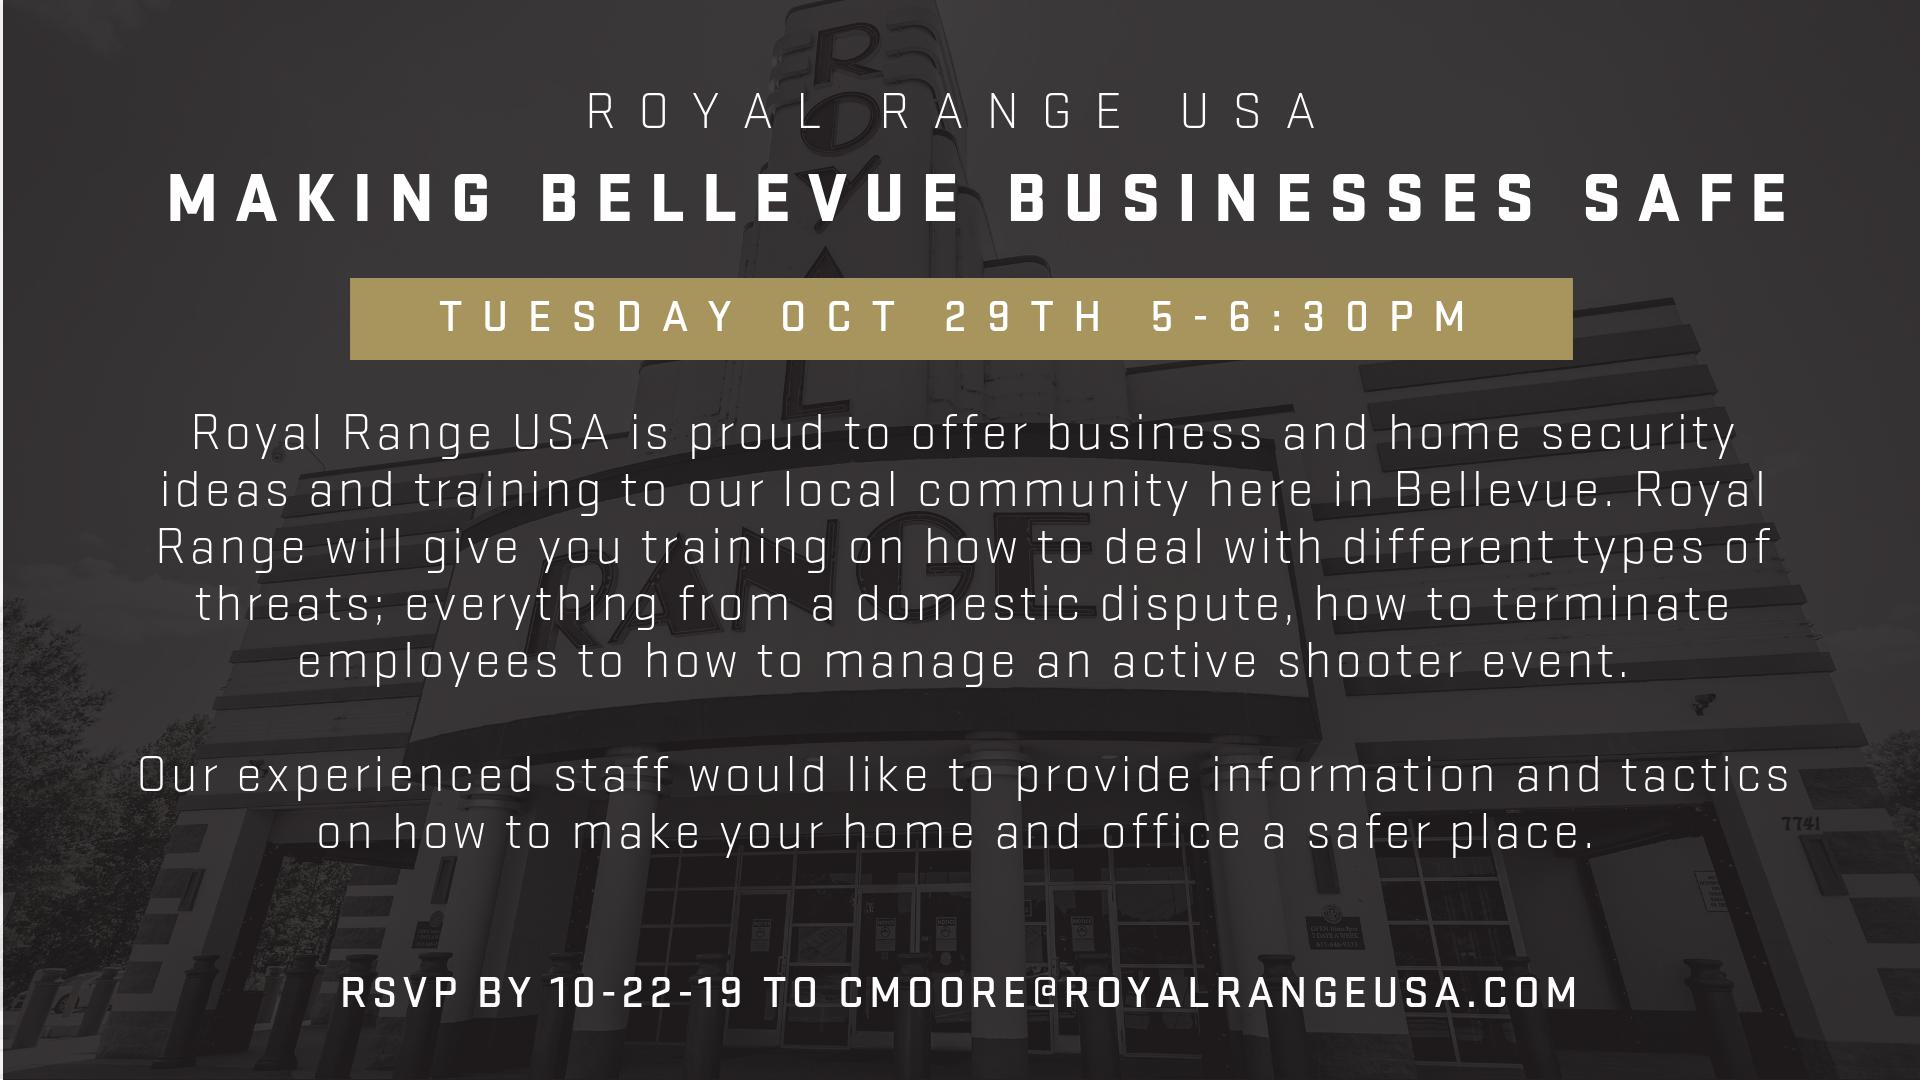 making-bellevue-tennessee-businesses-safe.jpg